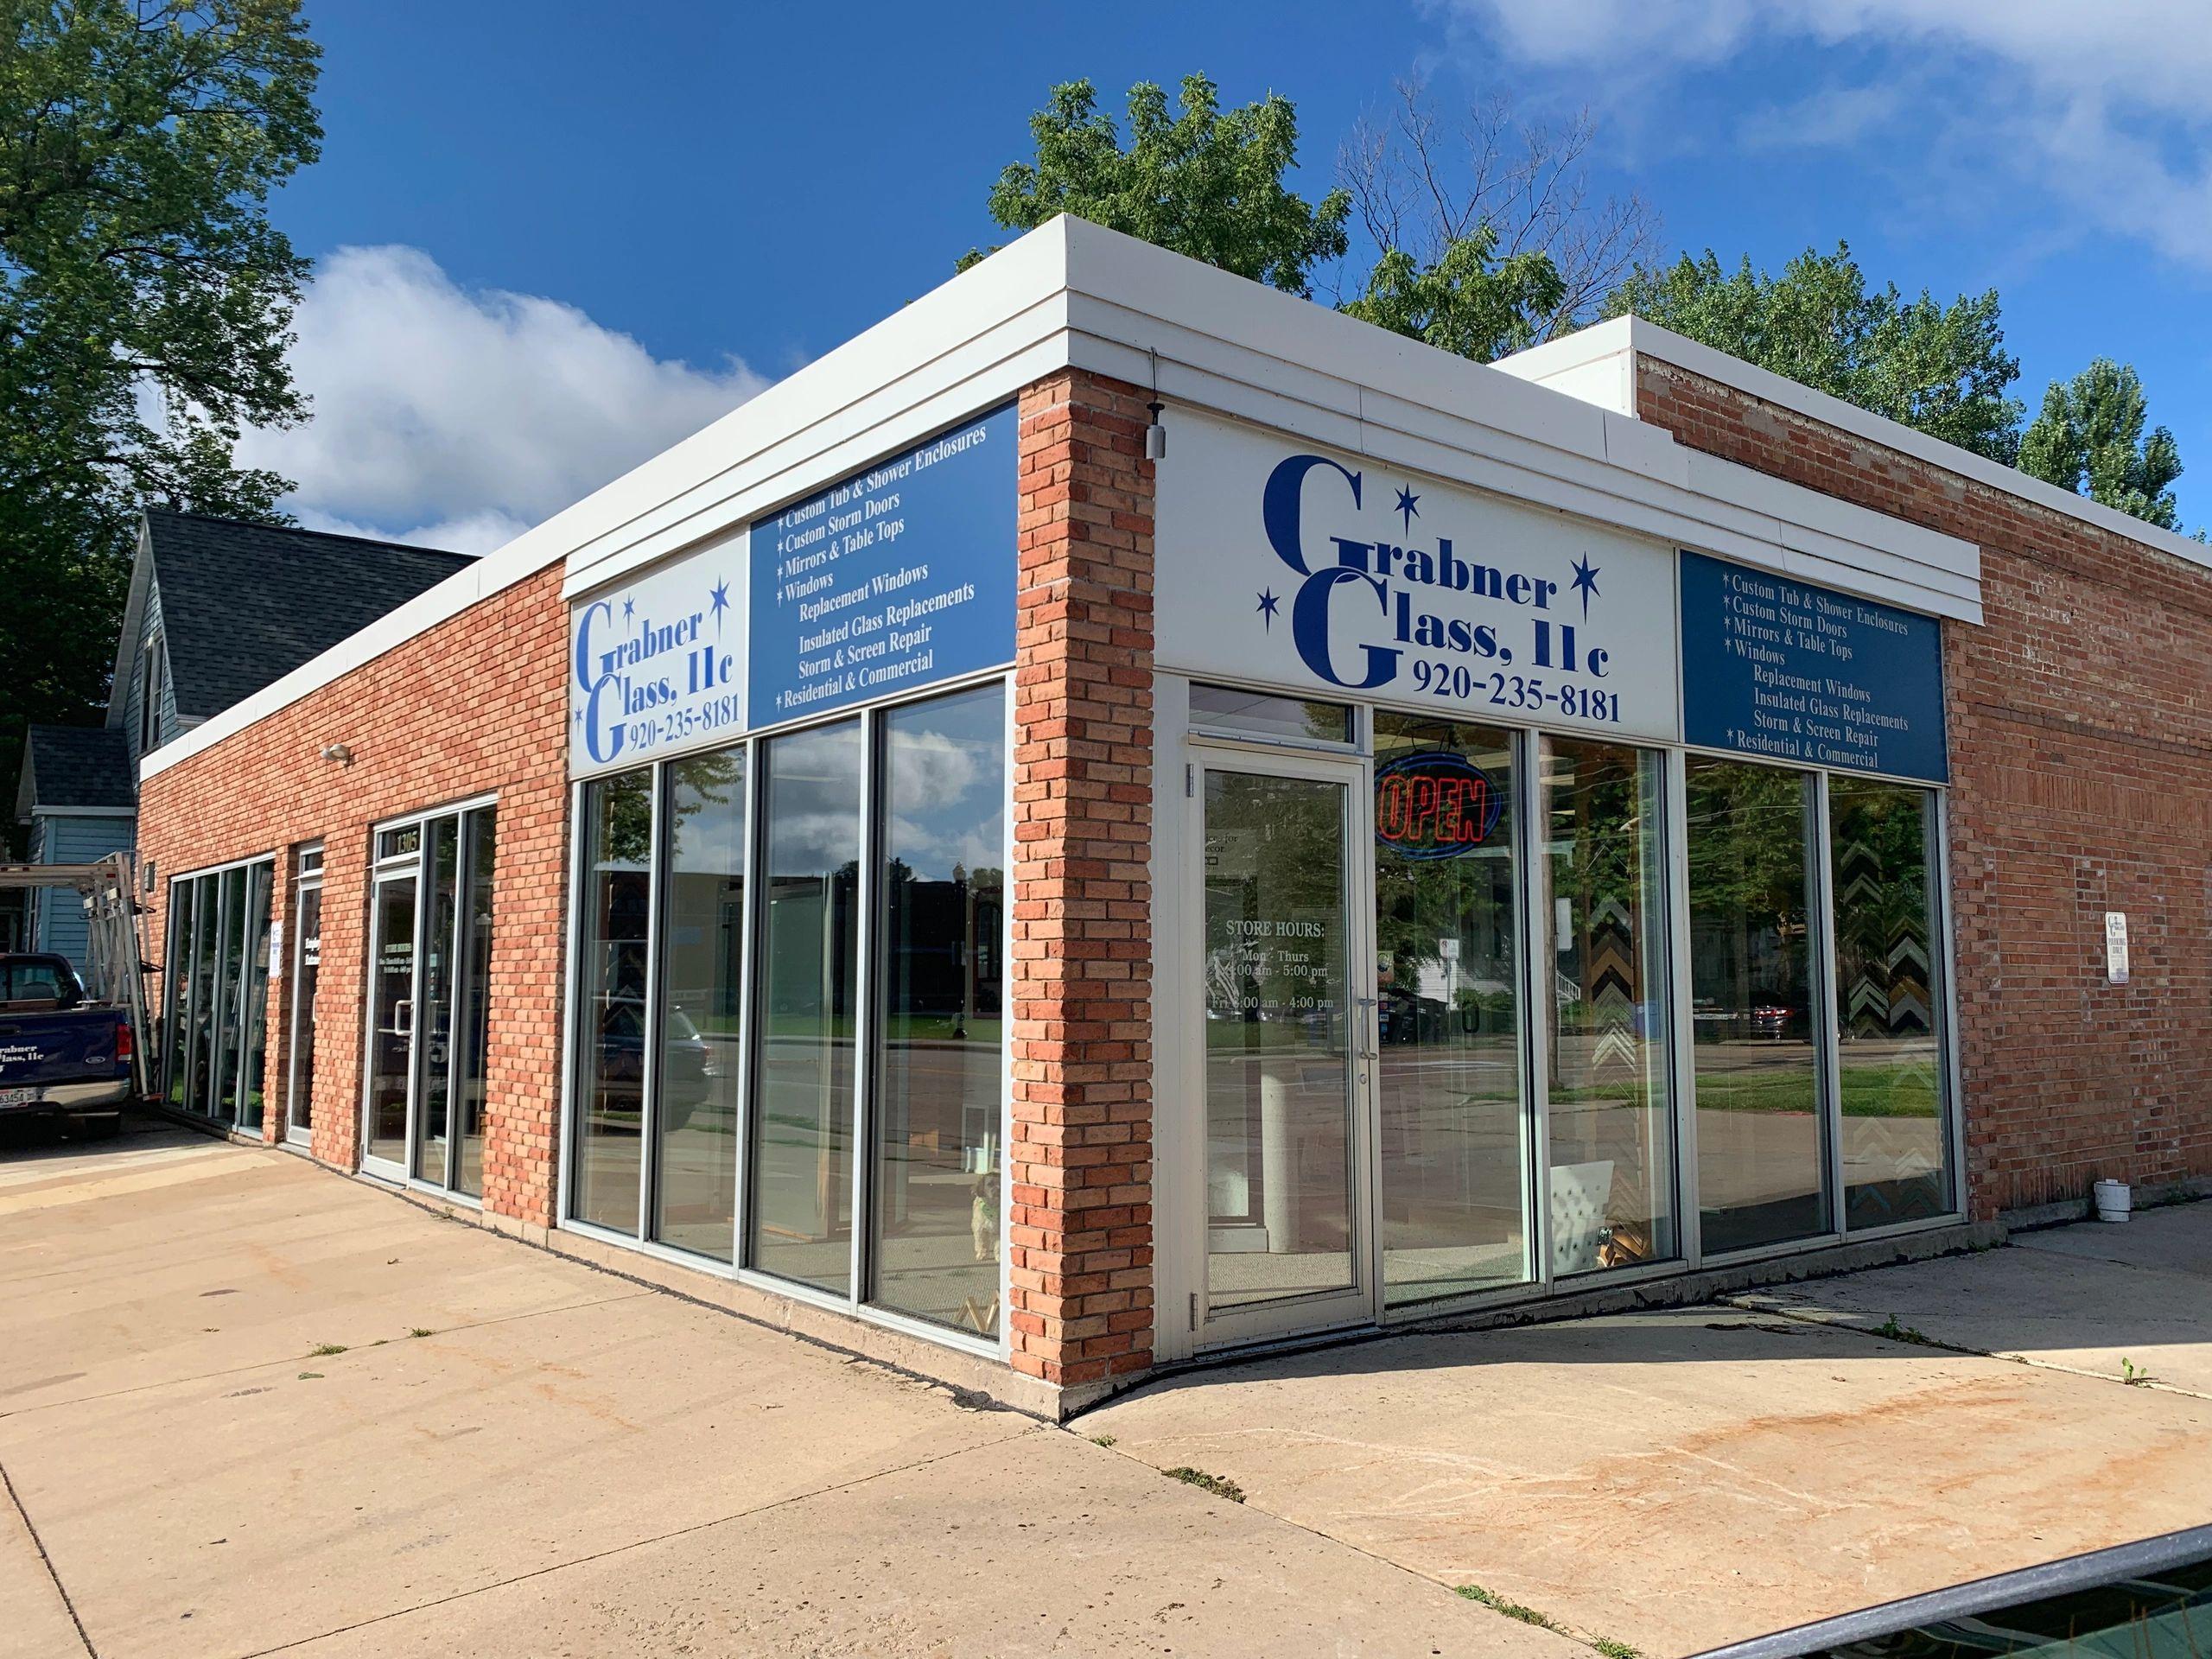 Storefront Windows And Doors grabner glass, llc